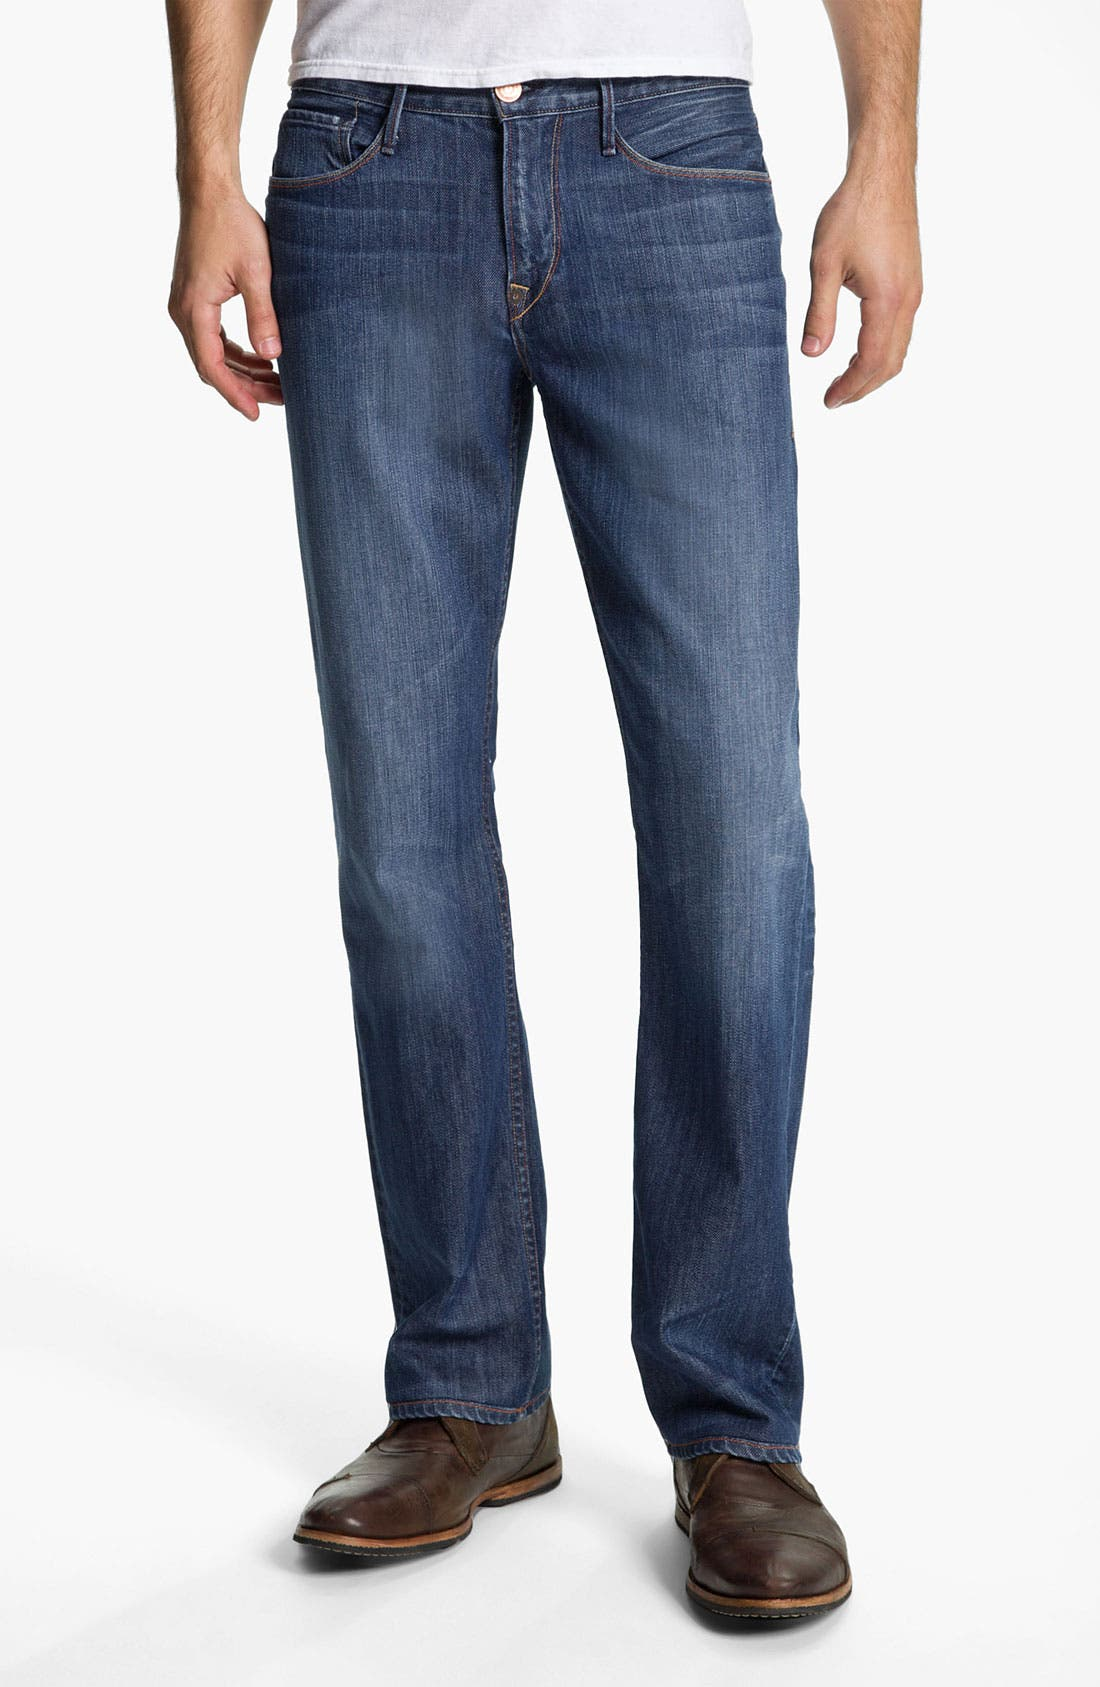 Alternate Image 1 Selected - Earnest Sewn 'Dexter' Relaxed Leg Jeans (Burton)